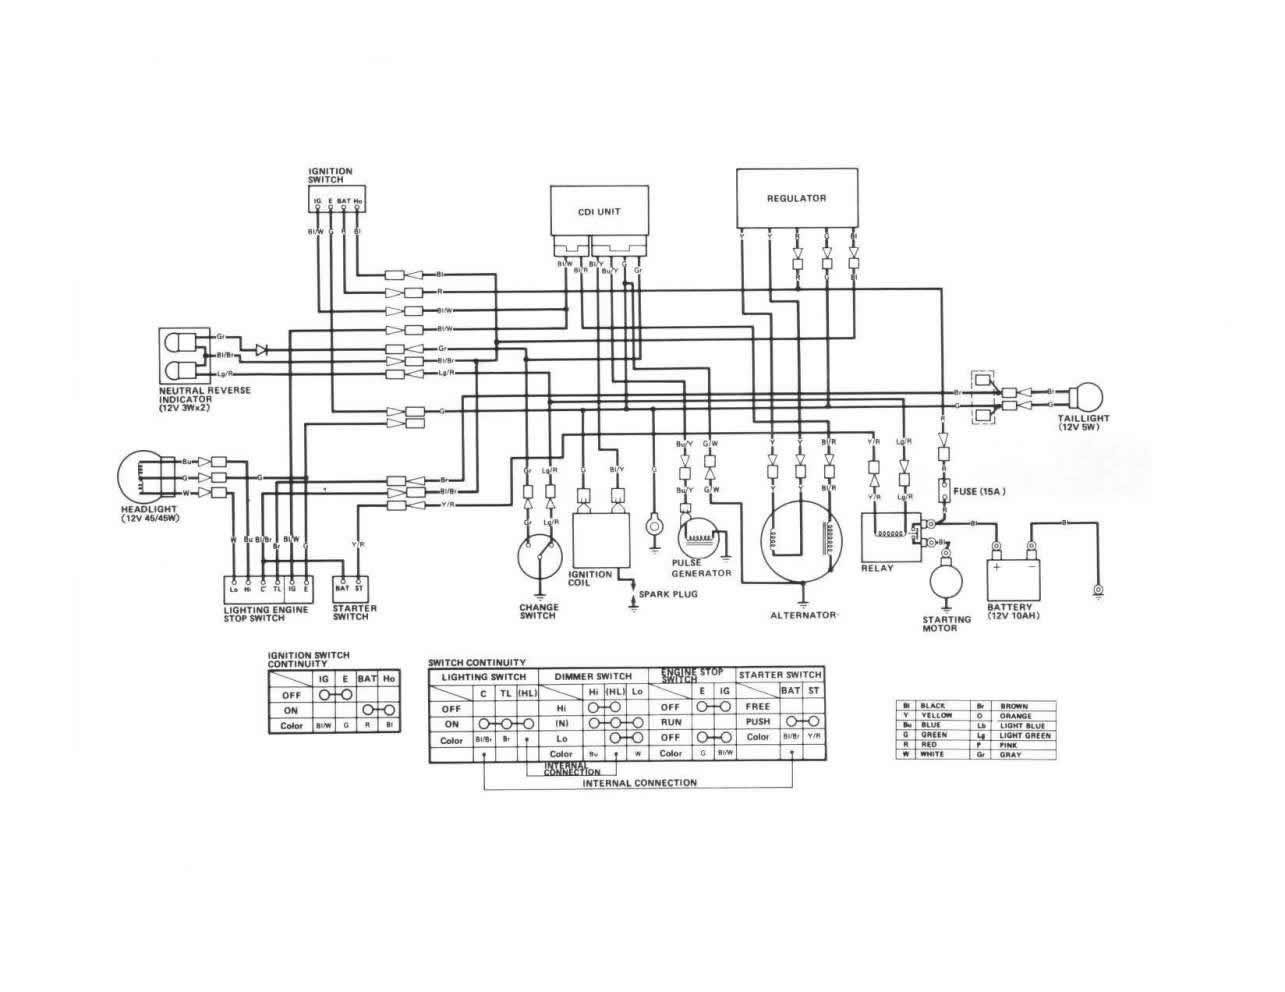 1990 honda fourtrax 300 wiring diagram 2000 ford taurus engine 125